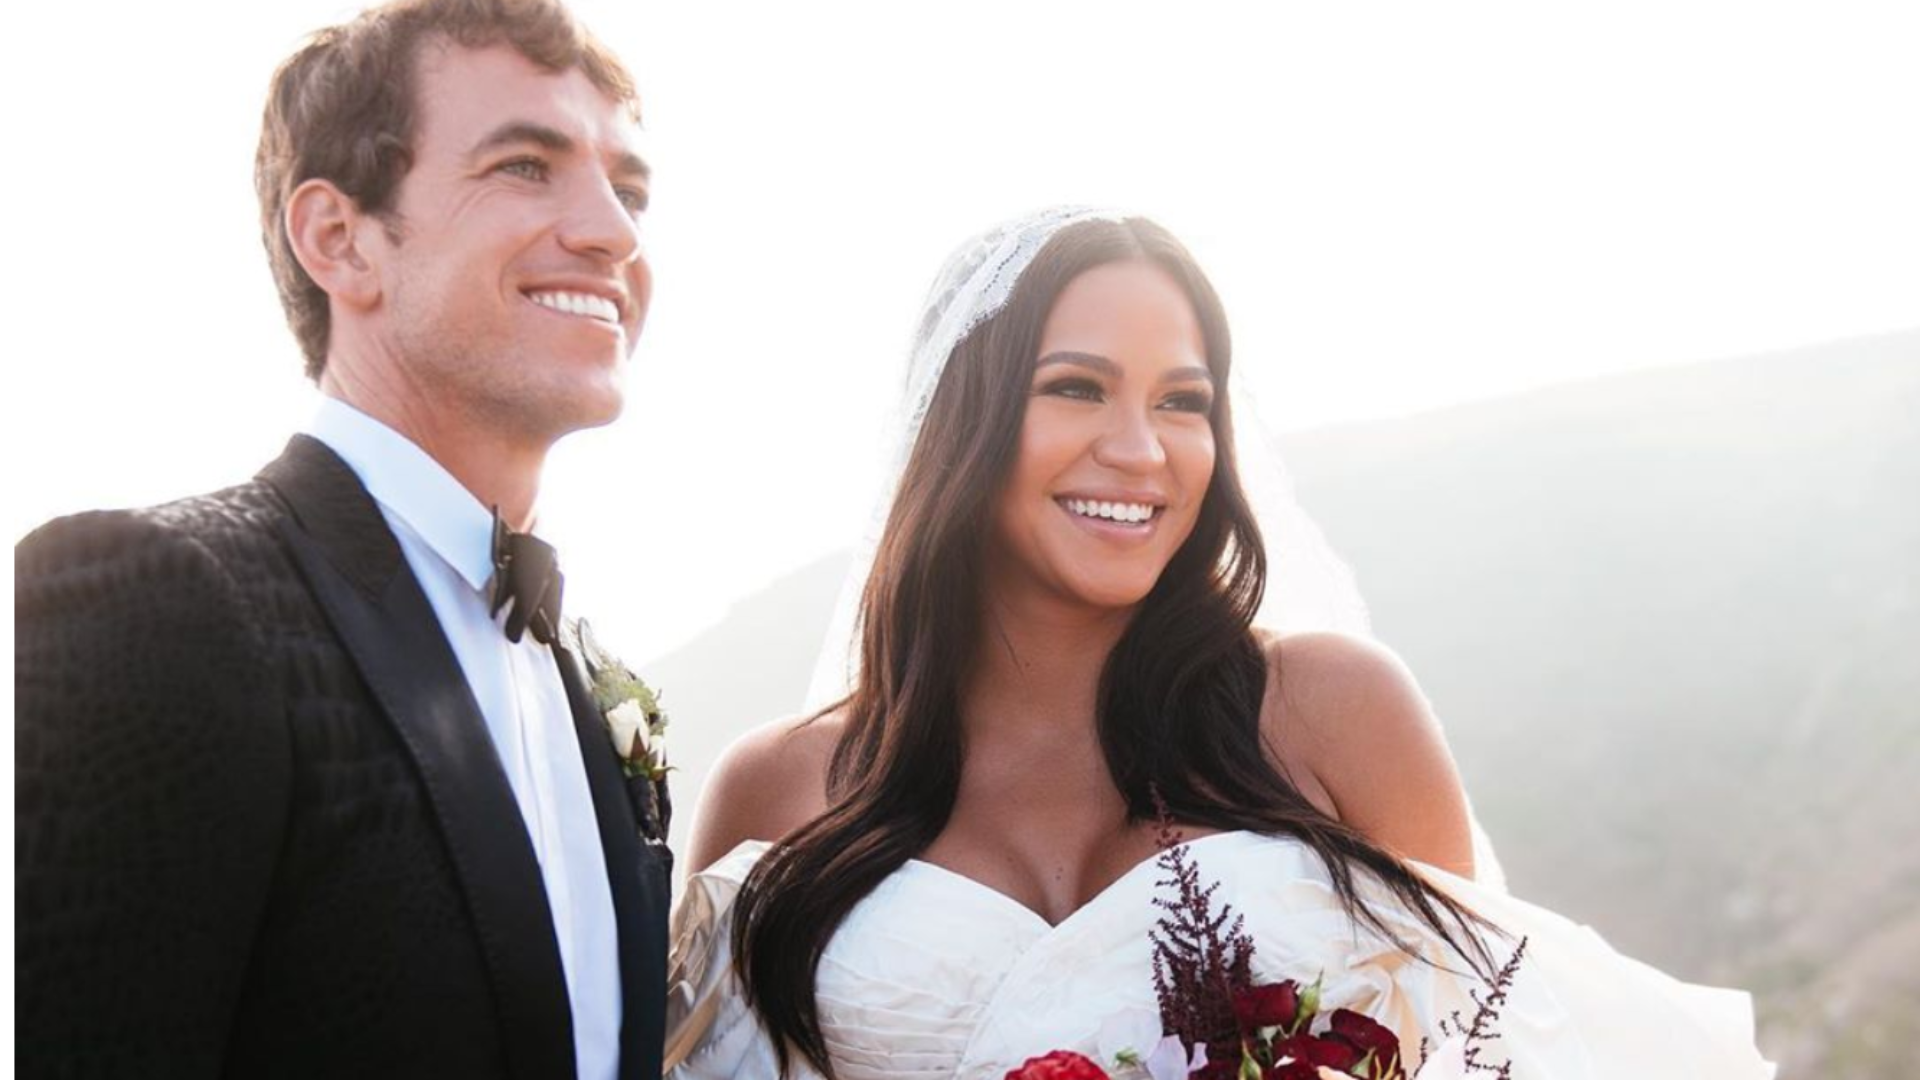 Cassie And Alex Fine Share More Stunning Wedding Photos